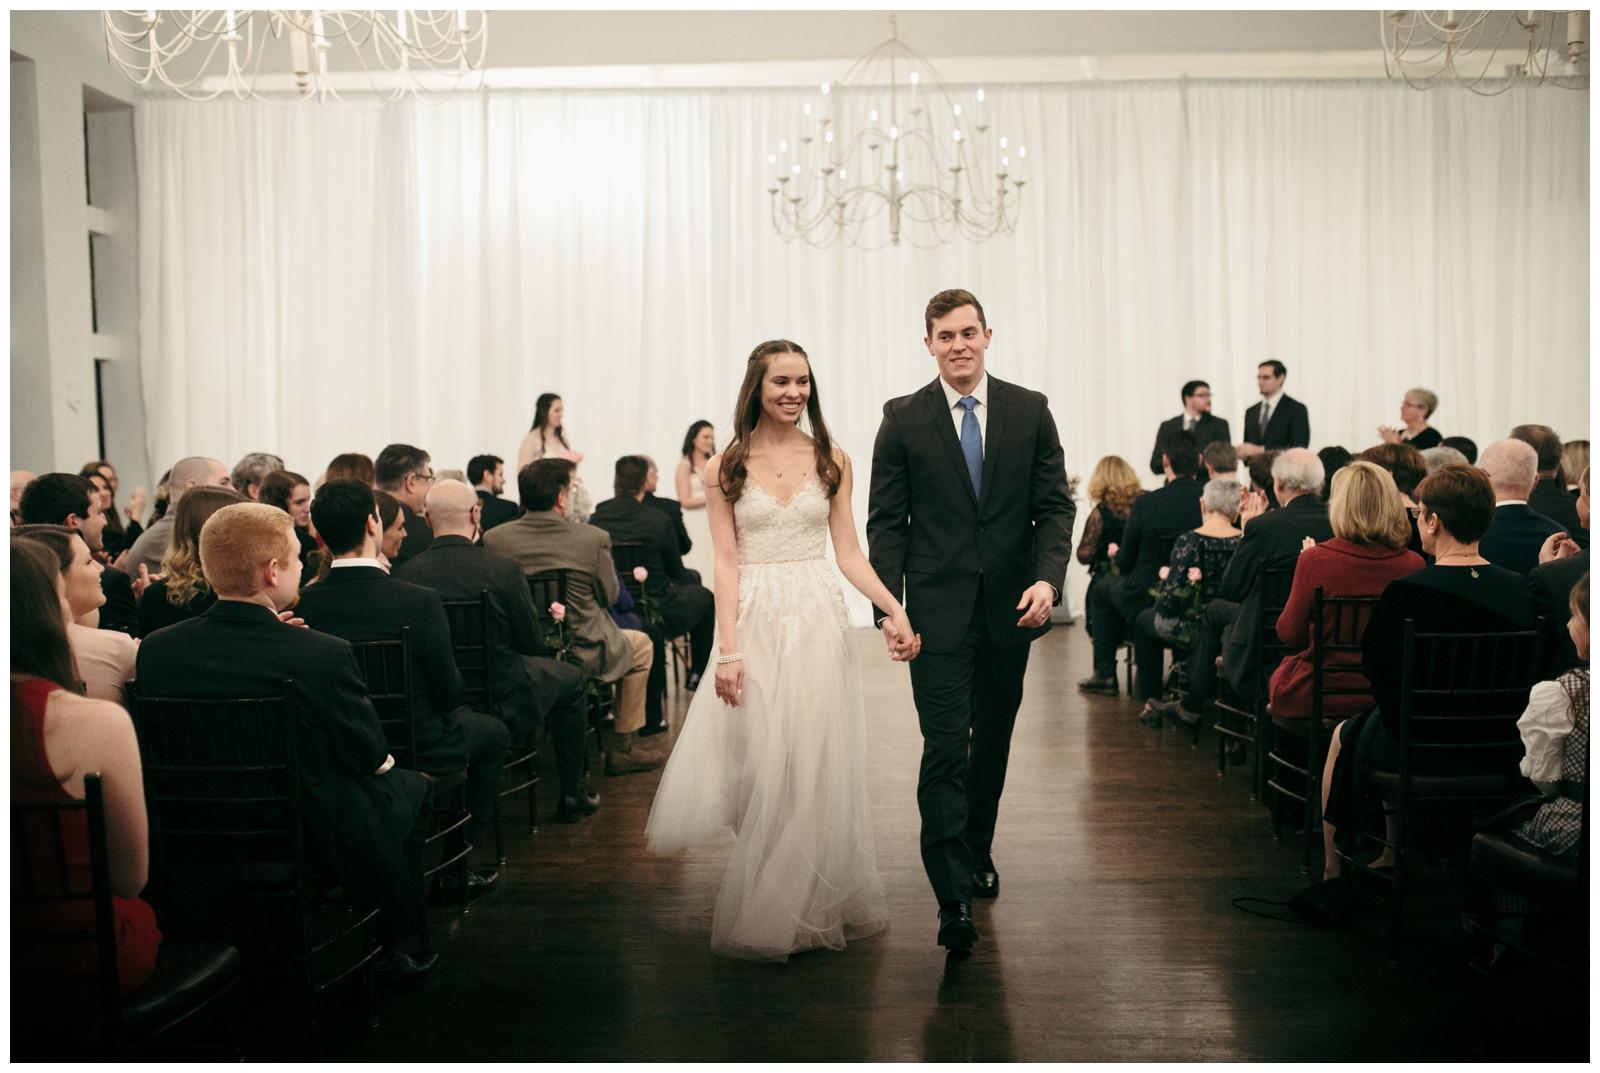 Alden-Castle-Wedding-Boston-Bailey-Q-Photo-025.jpg